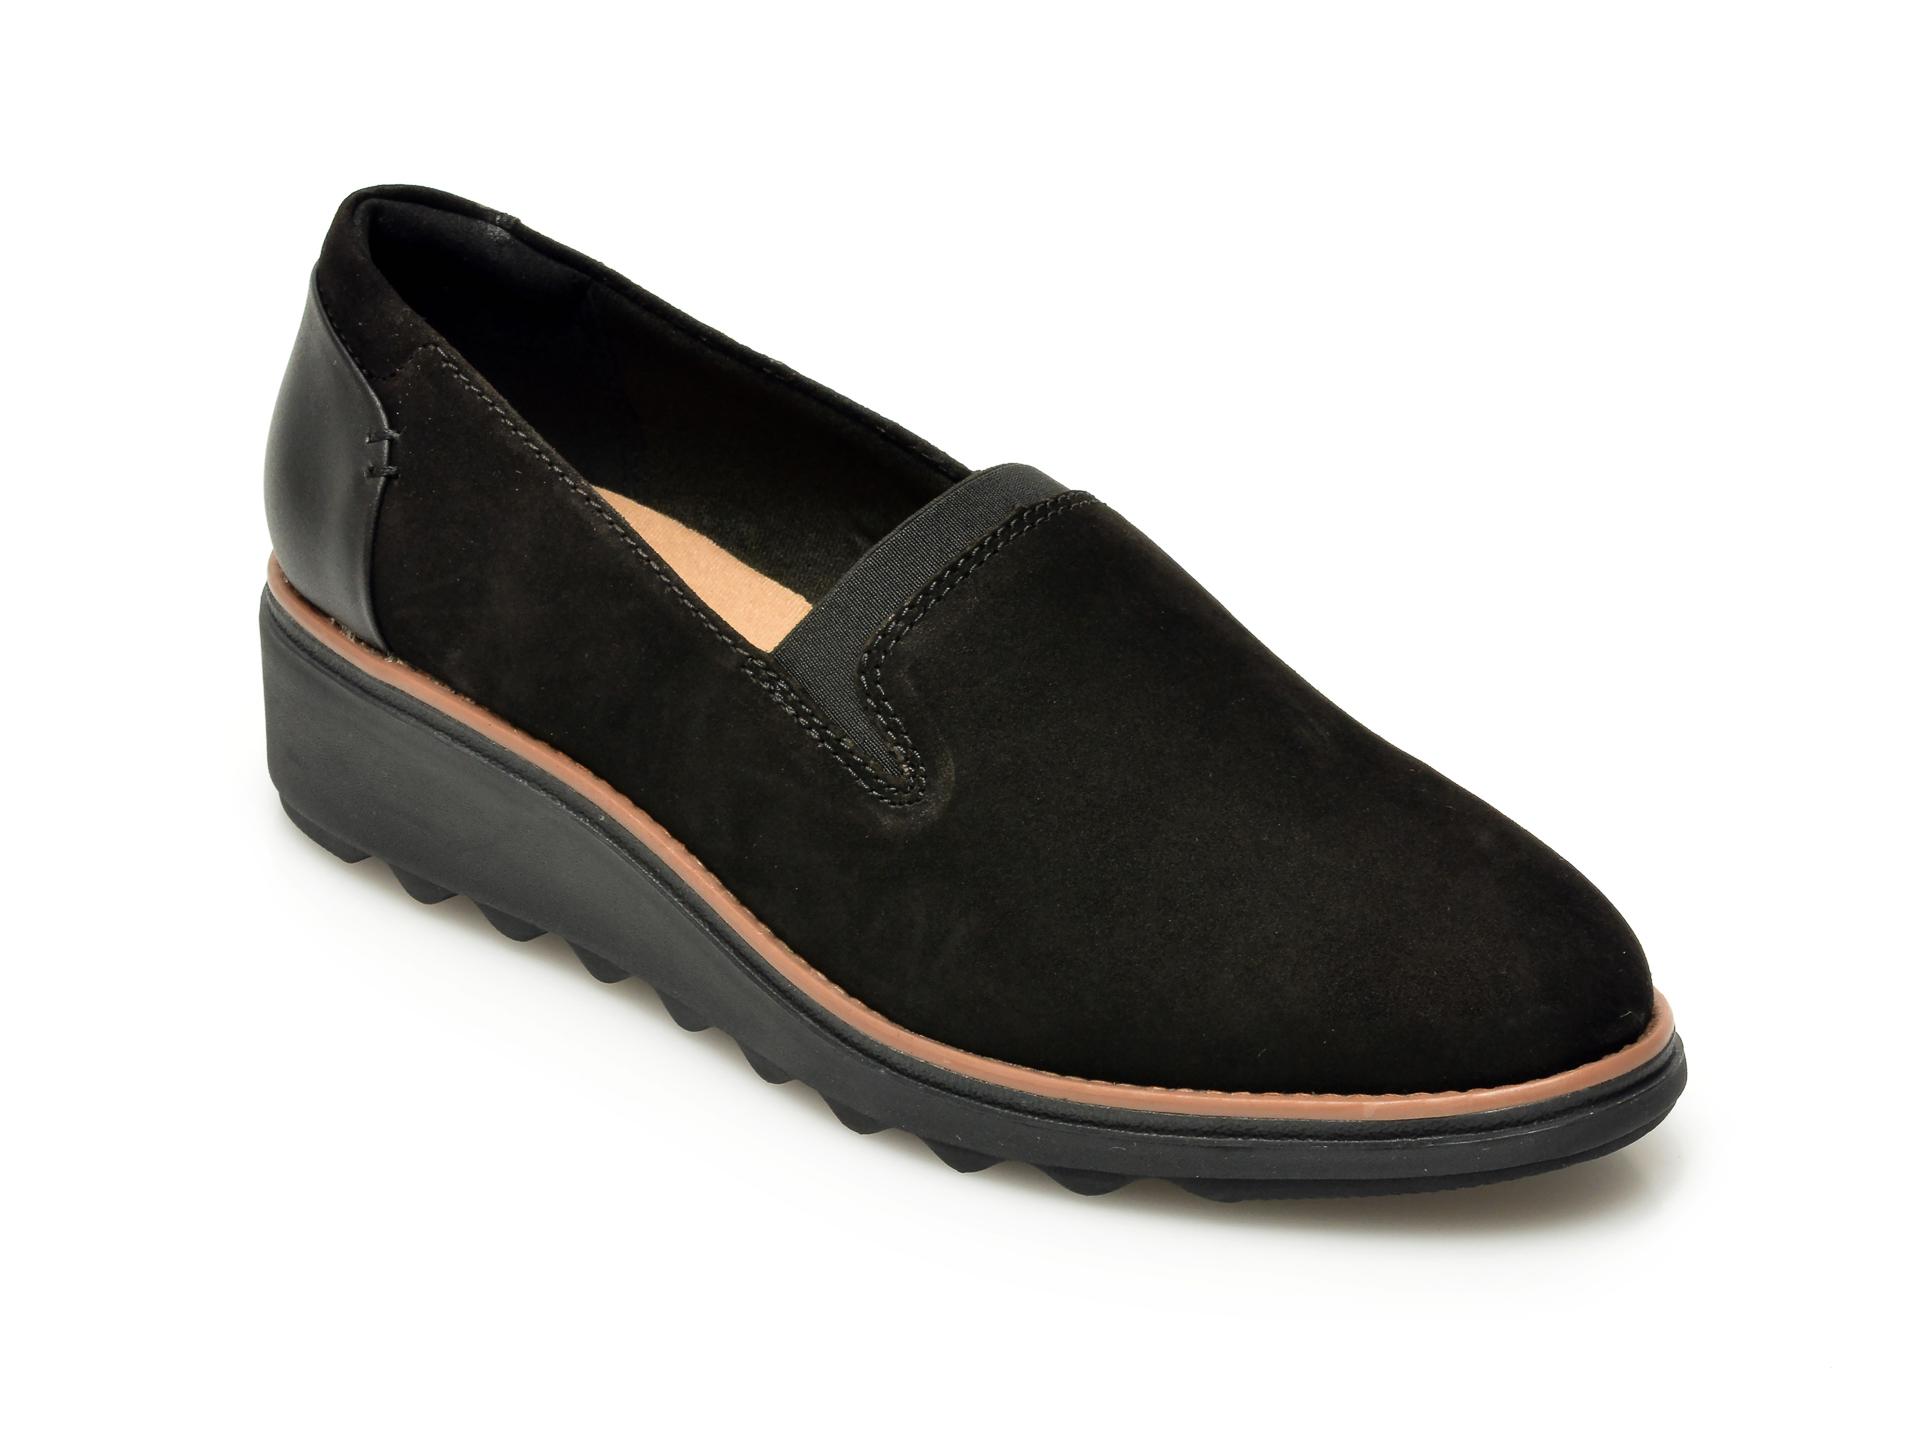 Pantofi CLARKS negri, Sharon Dolly, din piele intoarsa imagine otter.ro